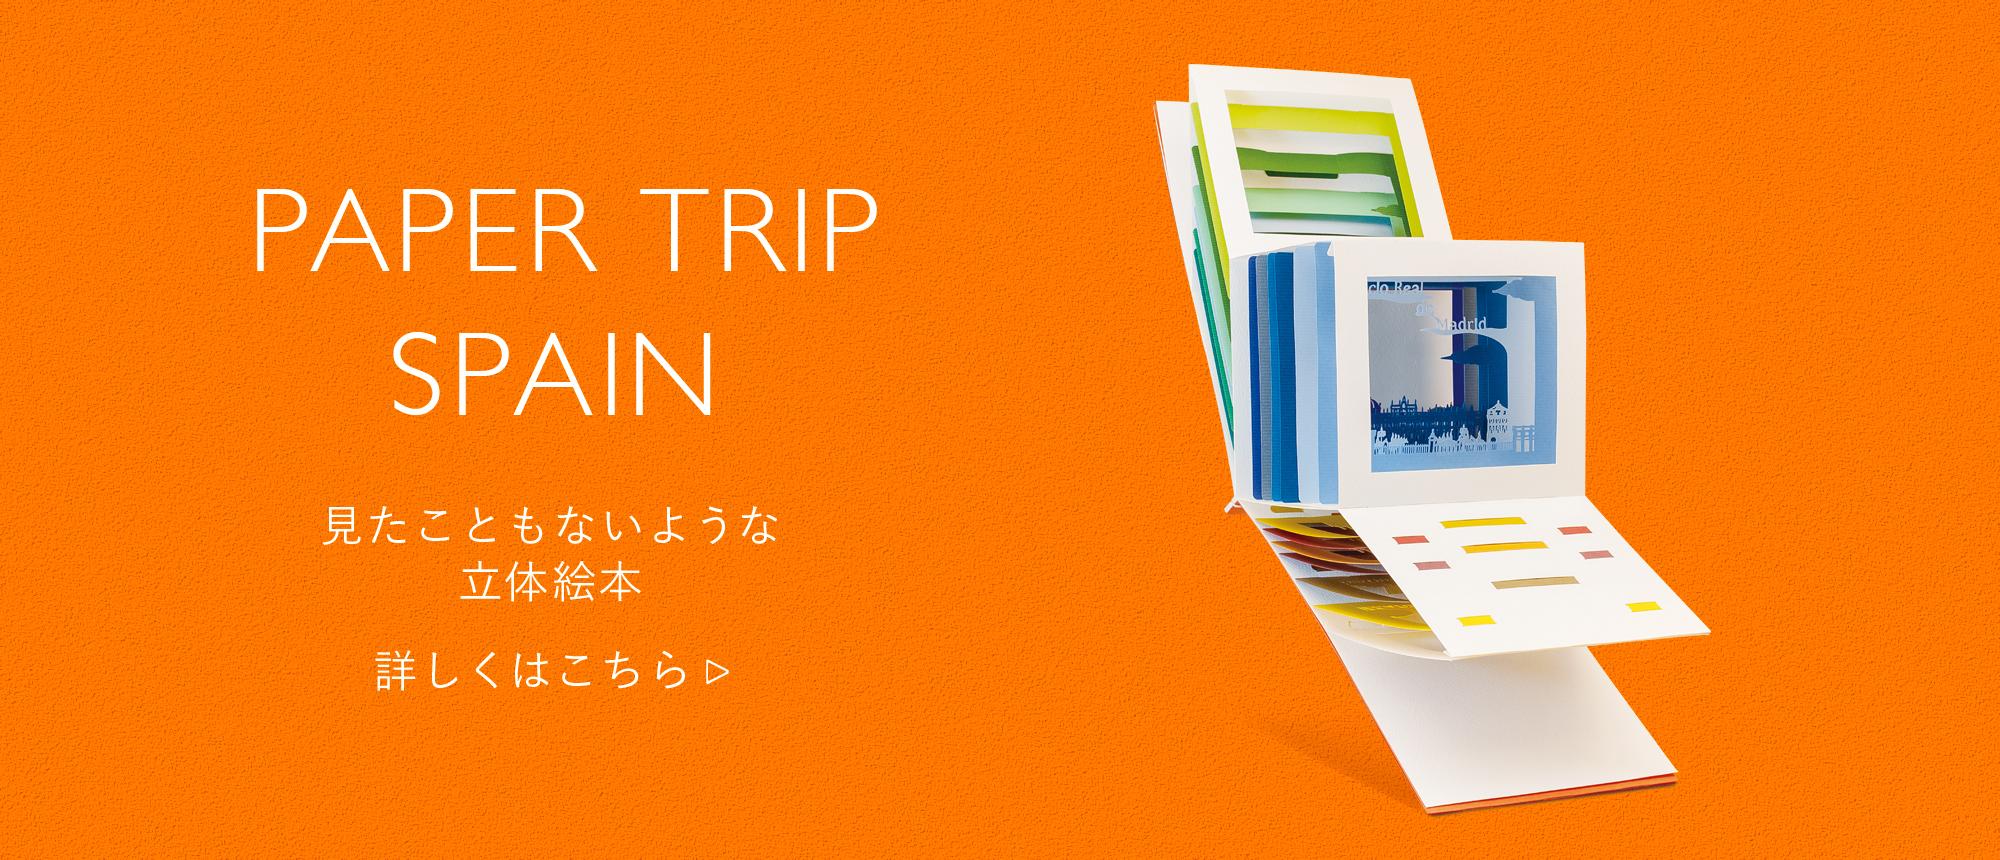 shinotghi_banner_01PAPER_TRIP_spain_v4